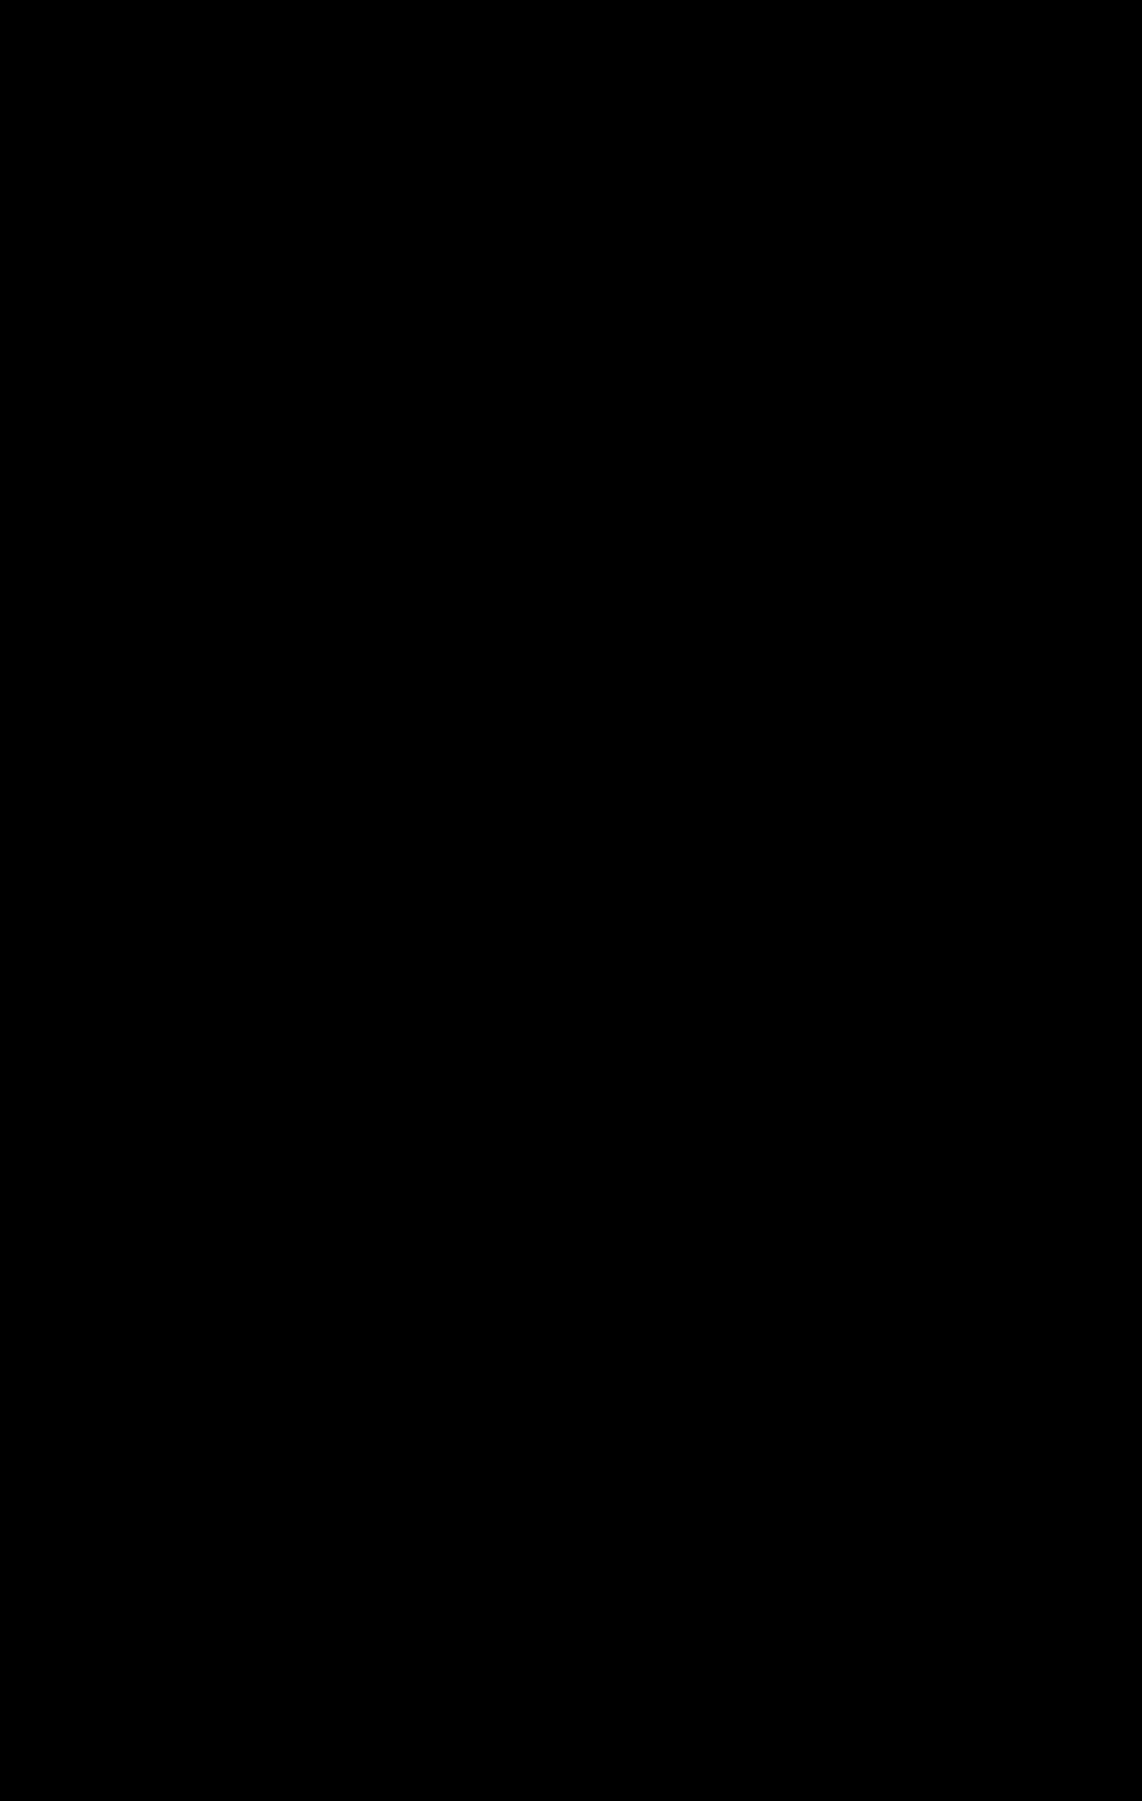 8 Badminton Silhouette (PNG Transparent) | OnlyGFX.com Badminton Player Png